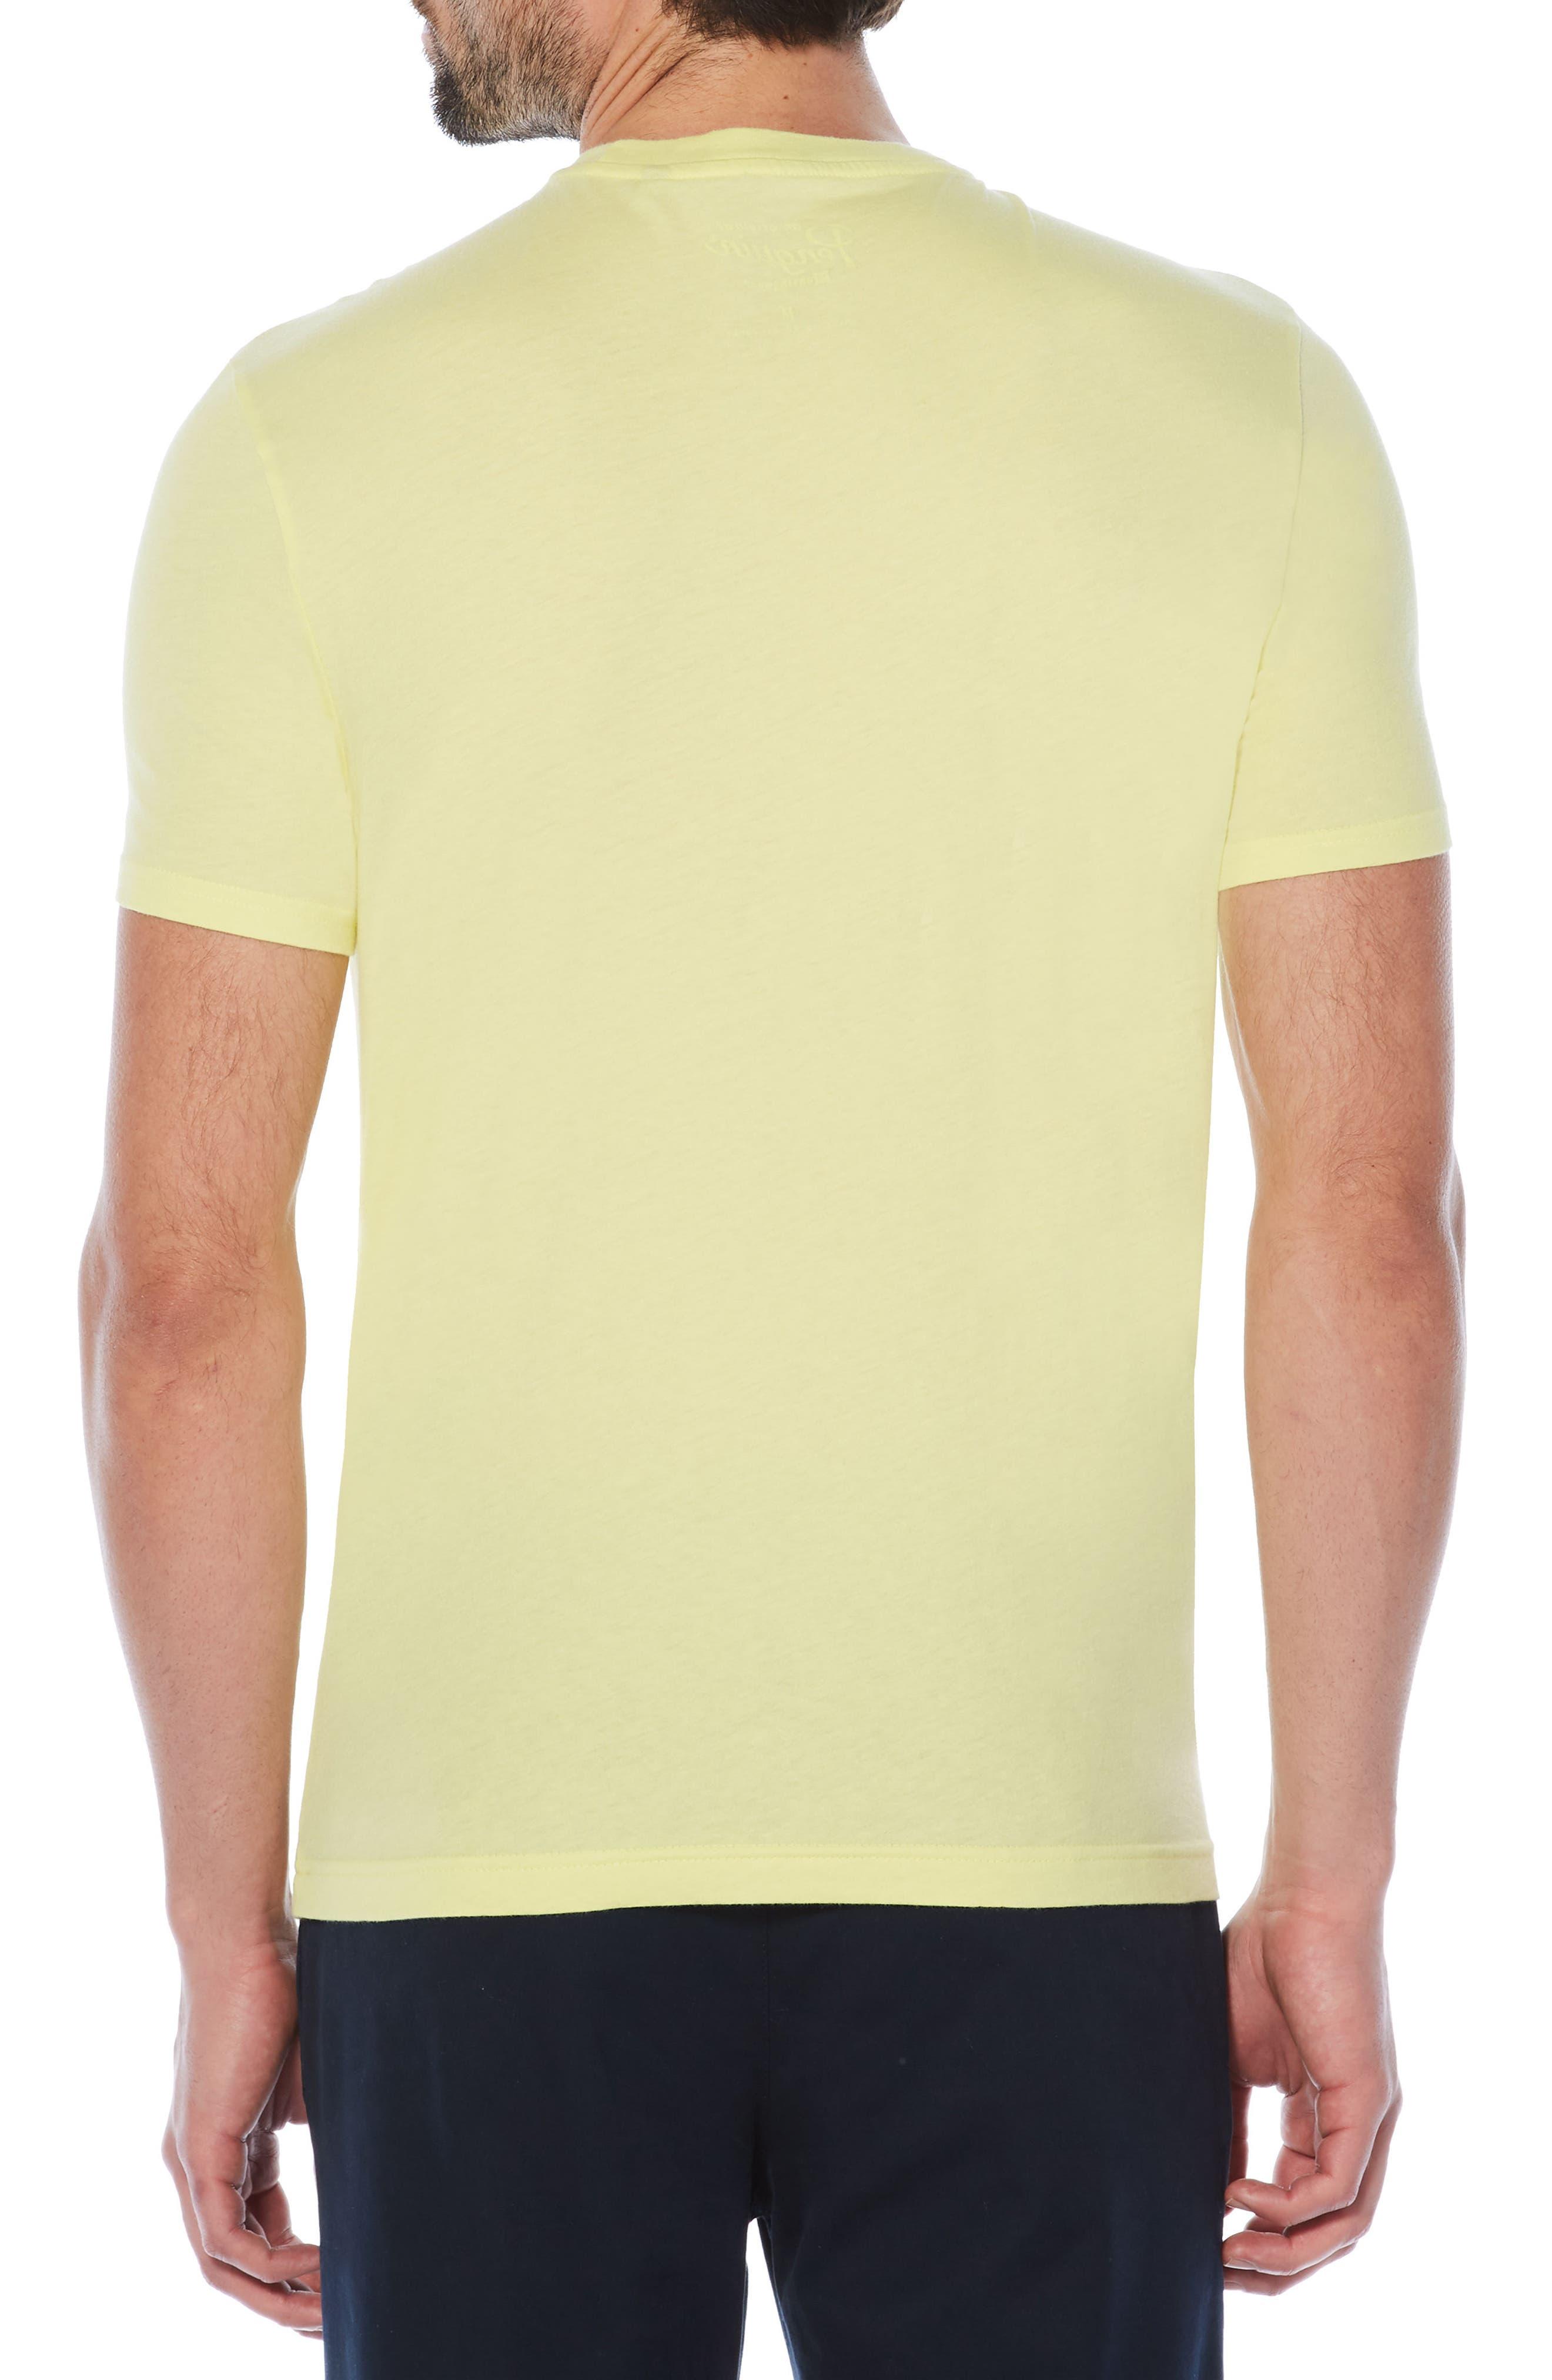 Alternate Image 2  - Original Penguin When Life Gives You Lemons T-Shirt